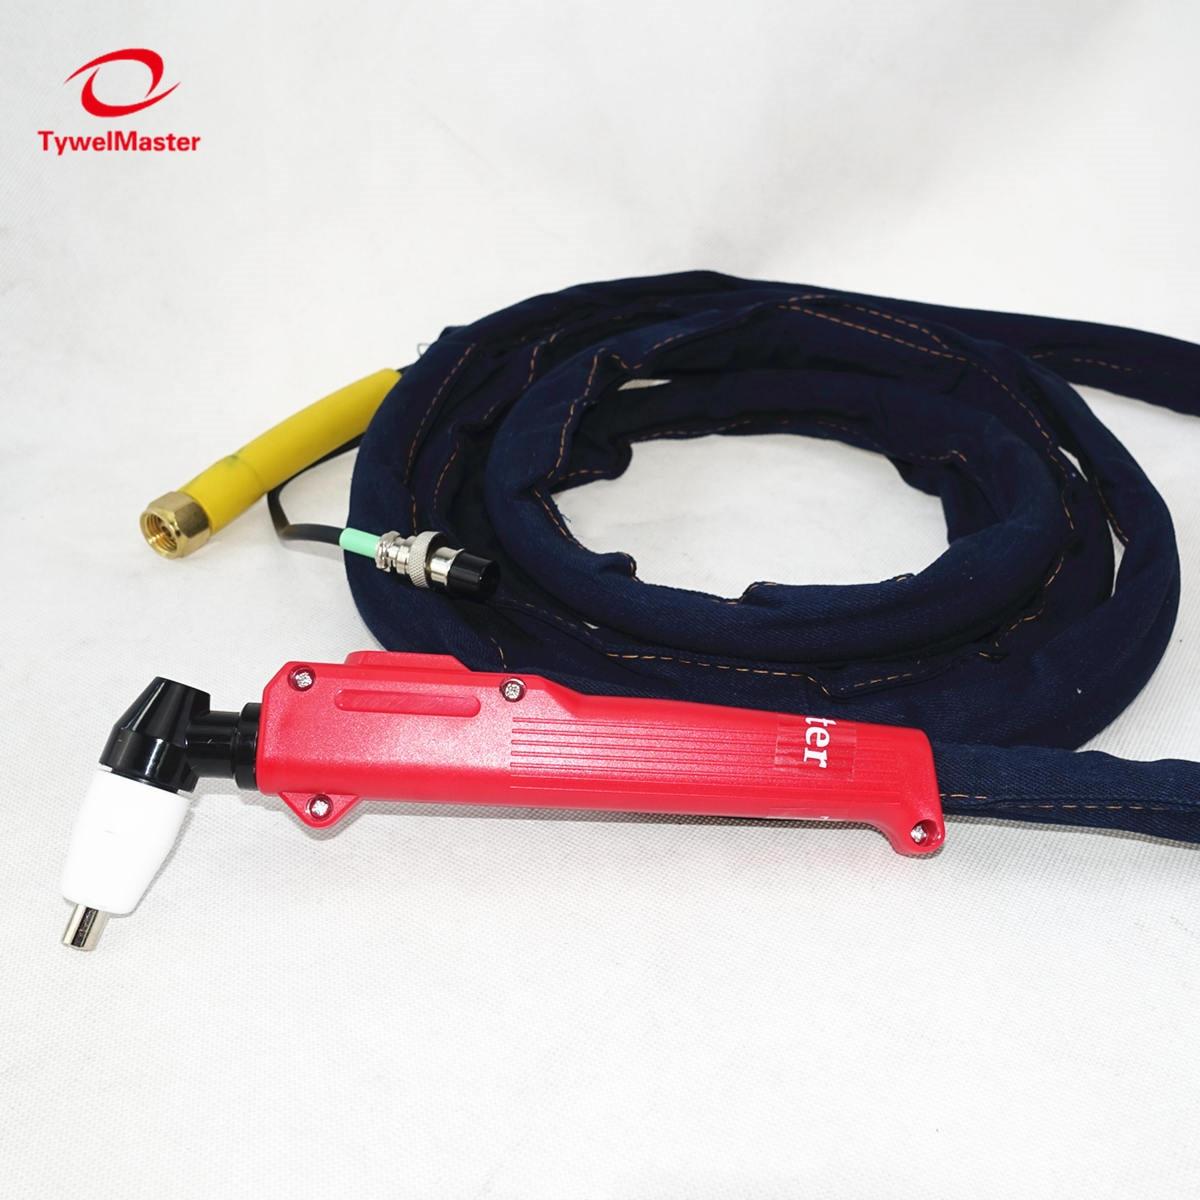 Gun Cutting 50A Plasma 30 Cutter Cutting Plasma 13ft Machine Torch PT31 Of Torch Plasma 4m